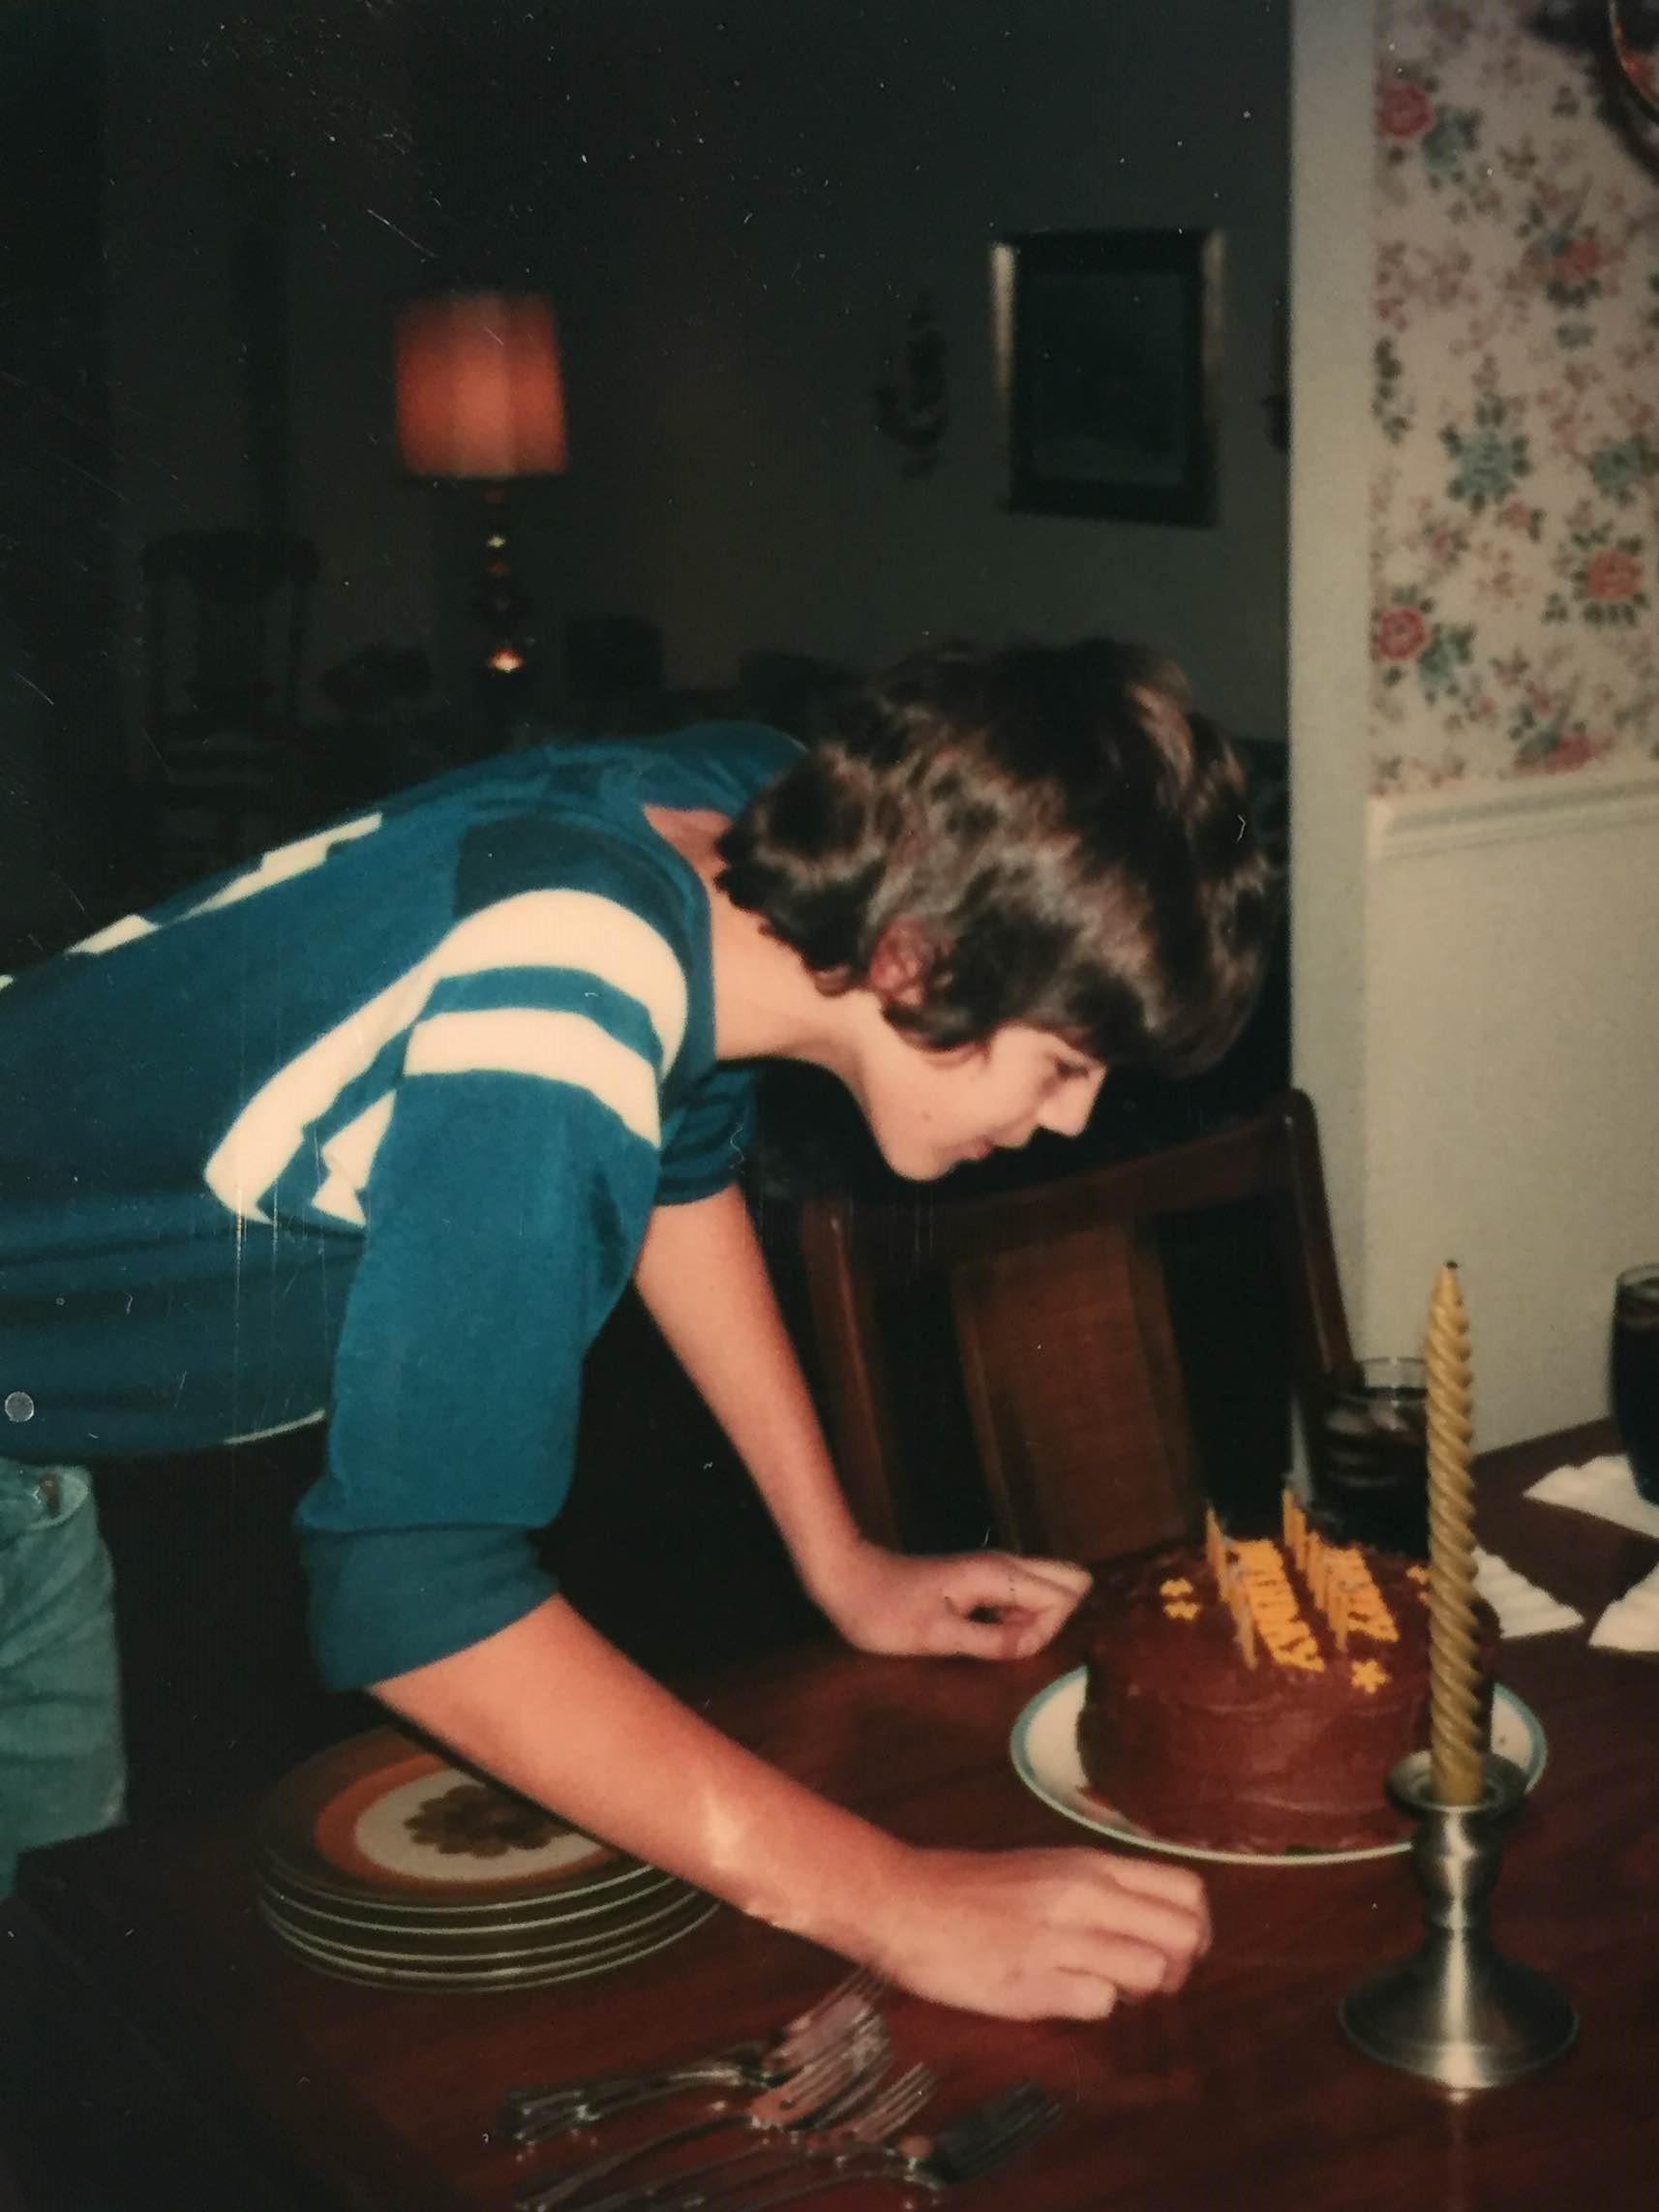 Thirteenth birthday. Also not traumatic.